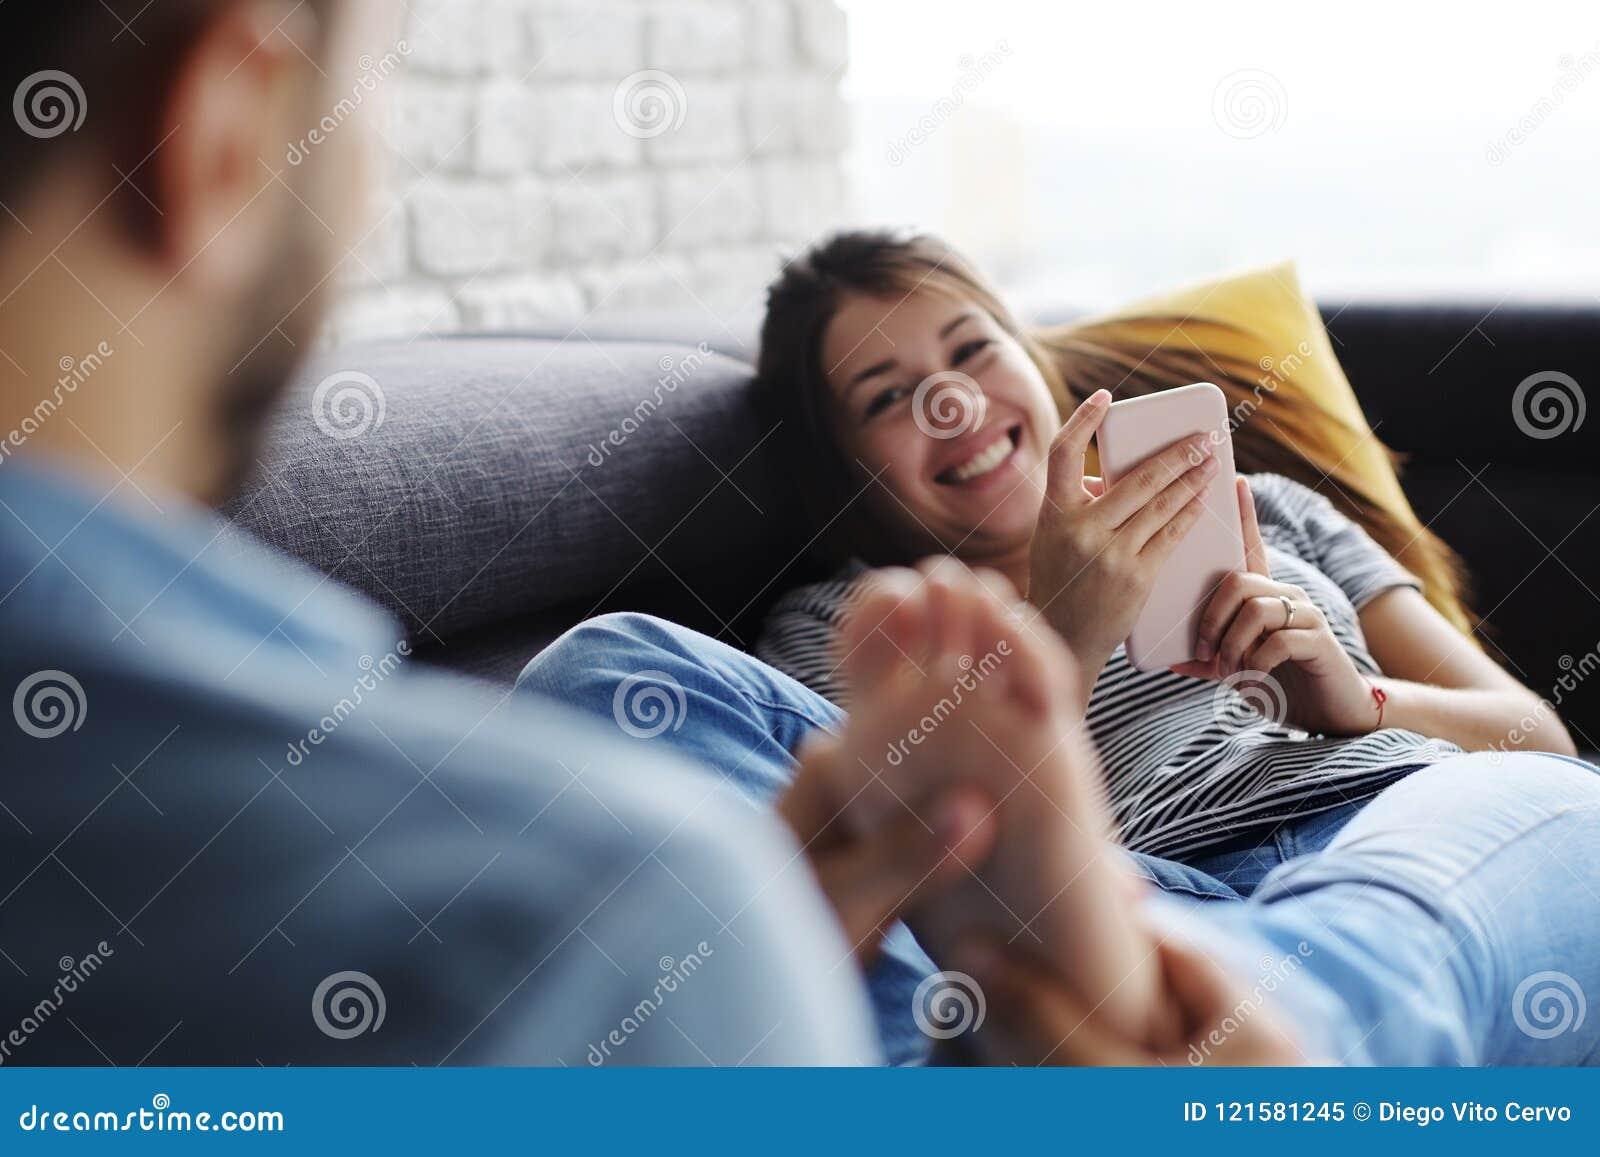 Mann Der Freundin Füße Auf Sofa At Home Massiert Stockbild Bild